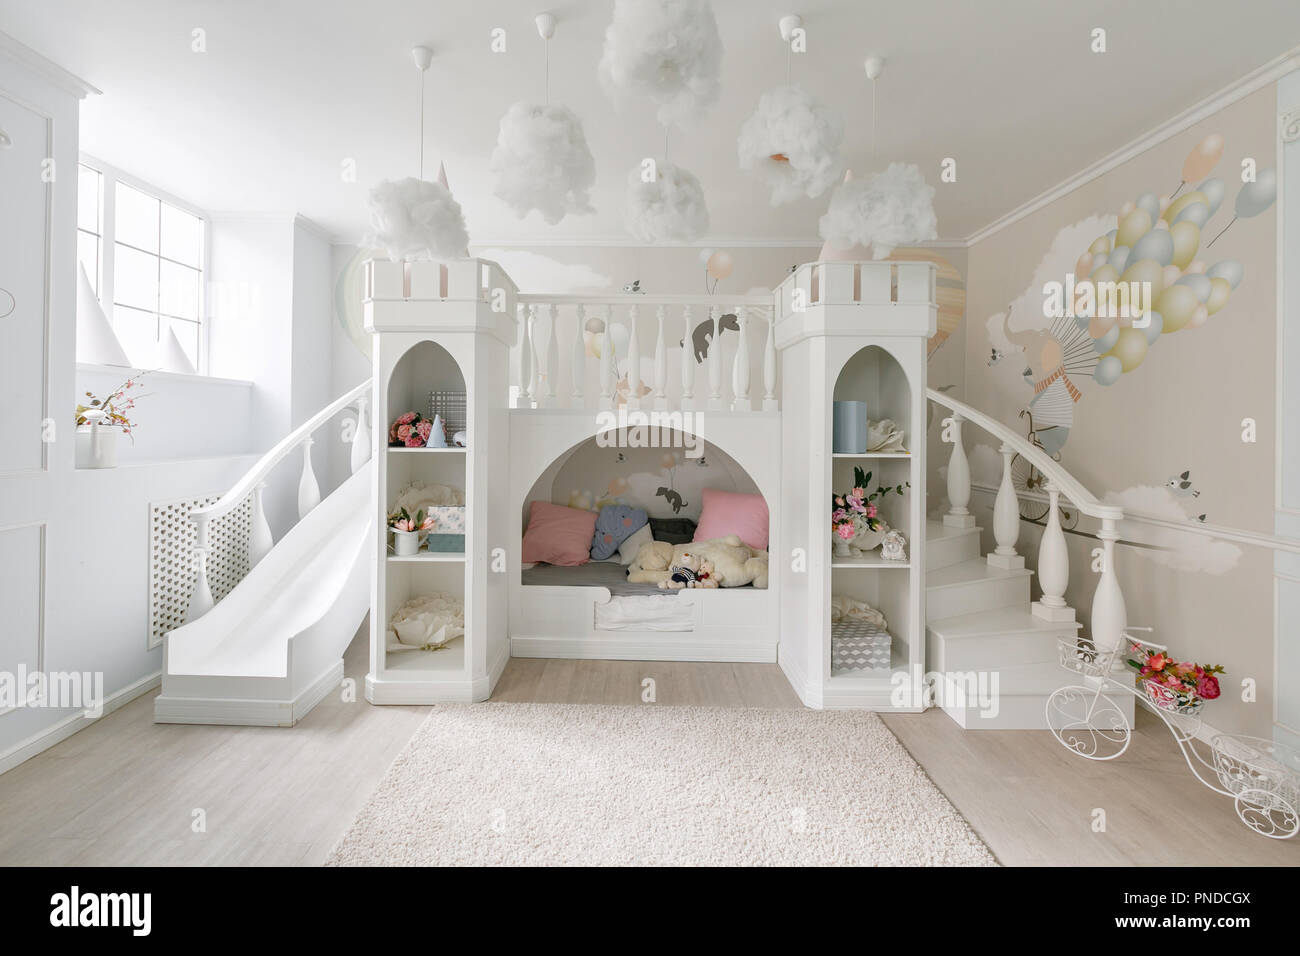 Interior of a spacious children 39 s room decorative castle - Children s room interior images ...